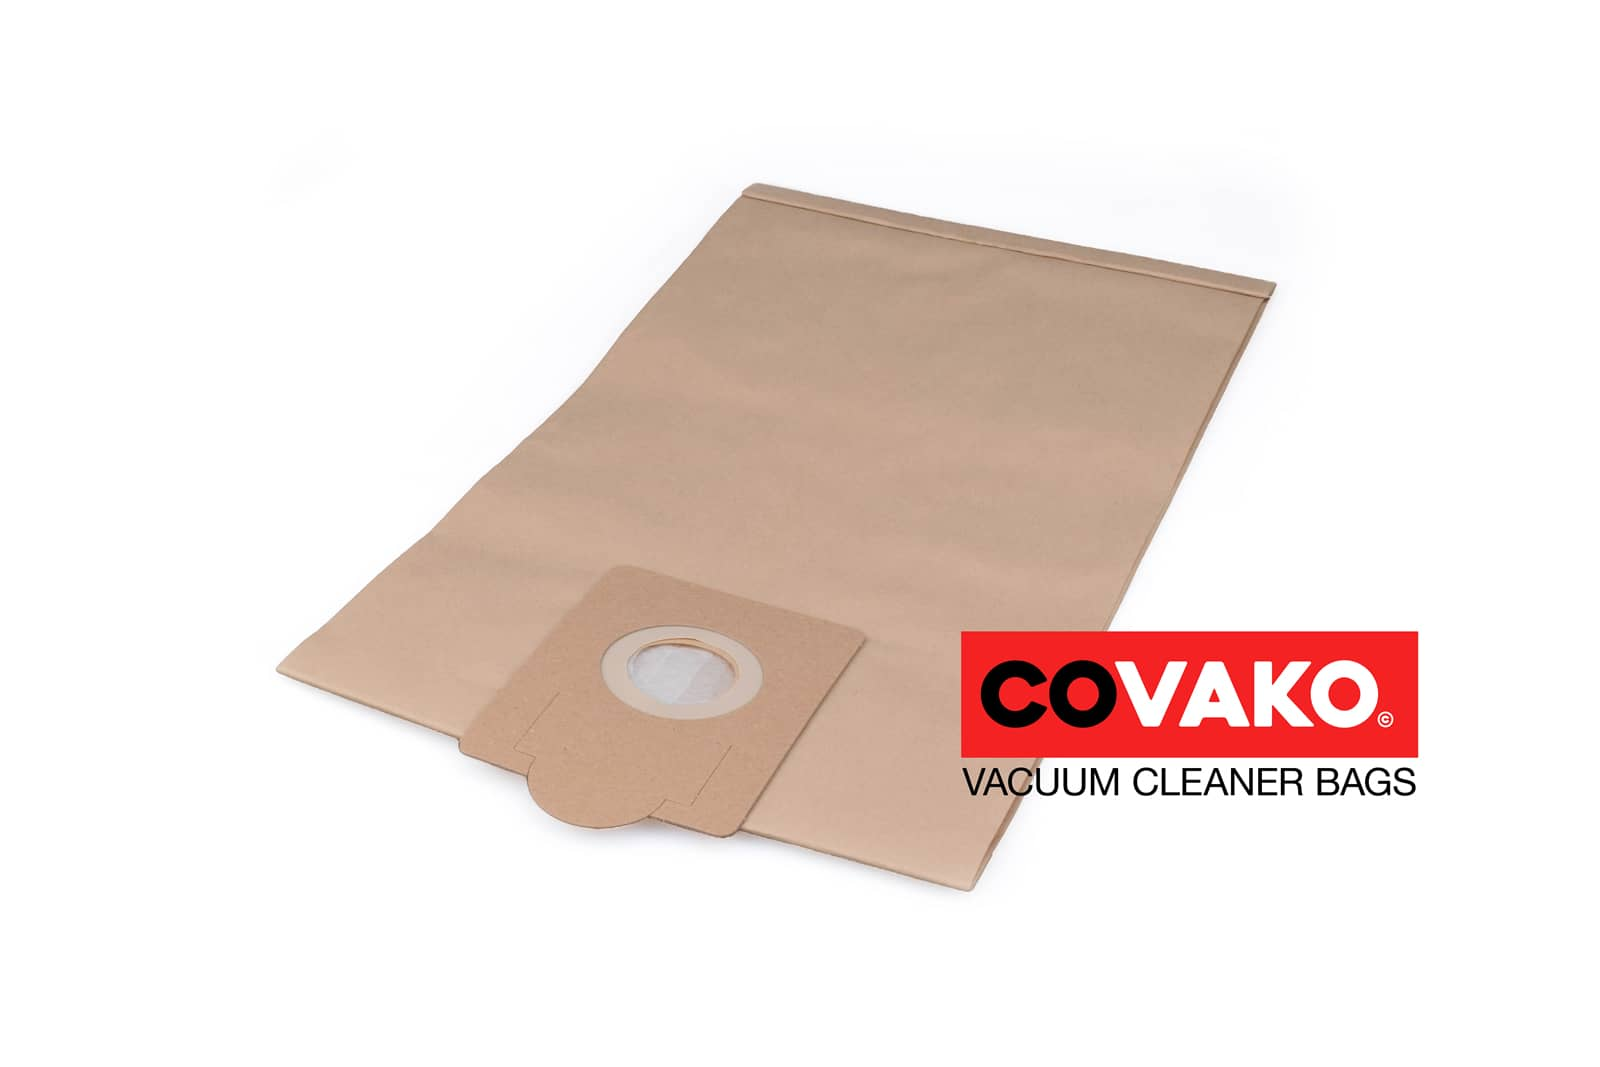 Fakir S 22 / Papier - Fakir sacs d'aspirateur